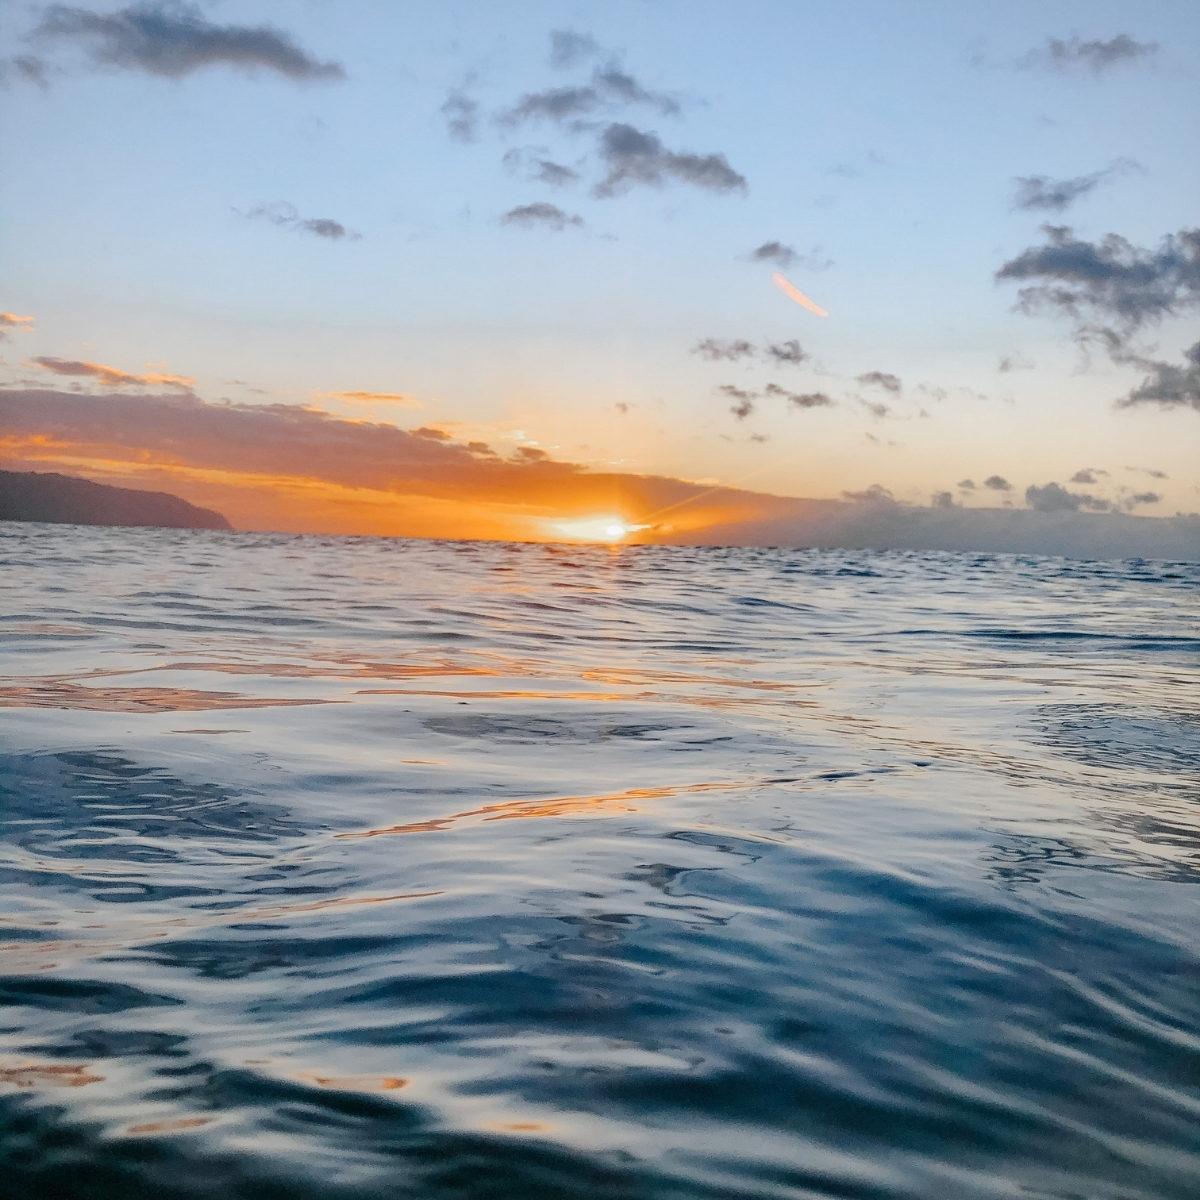 My Hawaii Travel Guide: Visiting Oahu | d-ravel.com